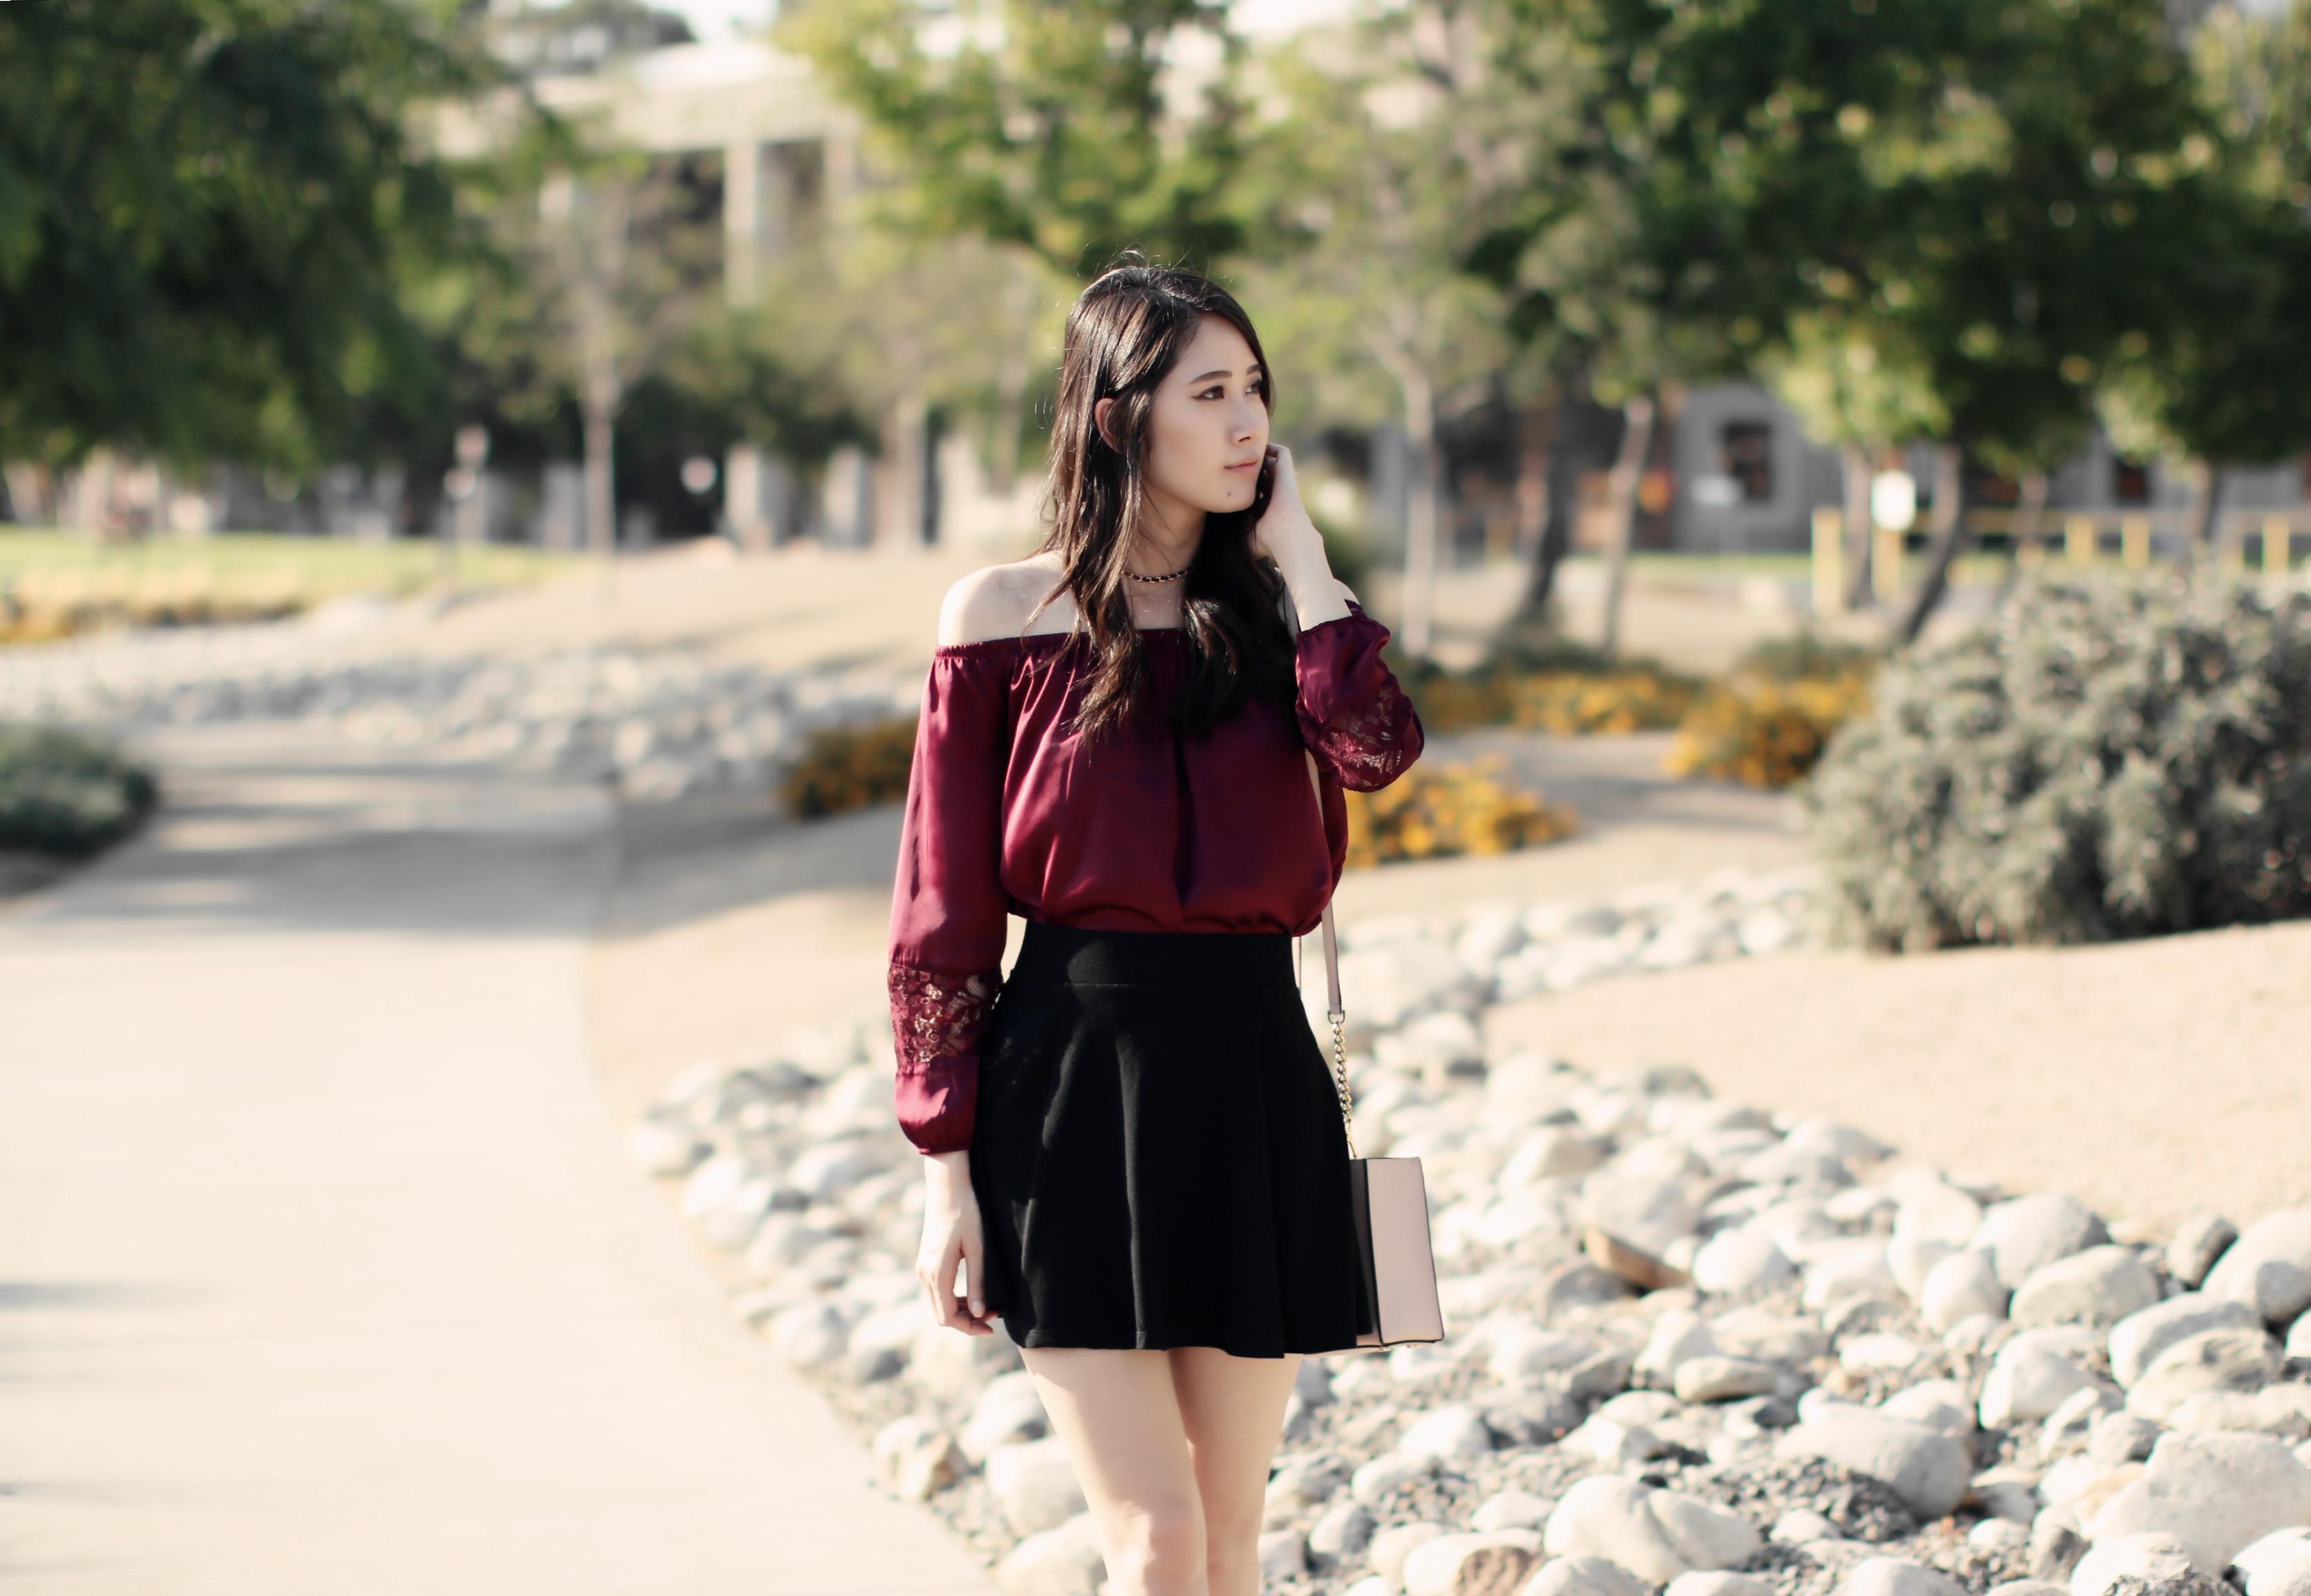 3594-ootd-fashion-style-outfitoftheday-wiwt-silk-lace-fallfashion-forever21-f21xme-elizabeeetht-clothestoyouuu